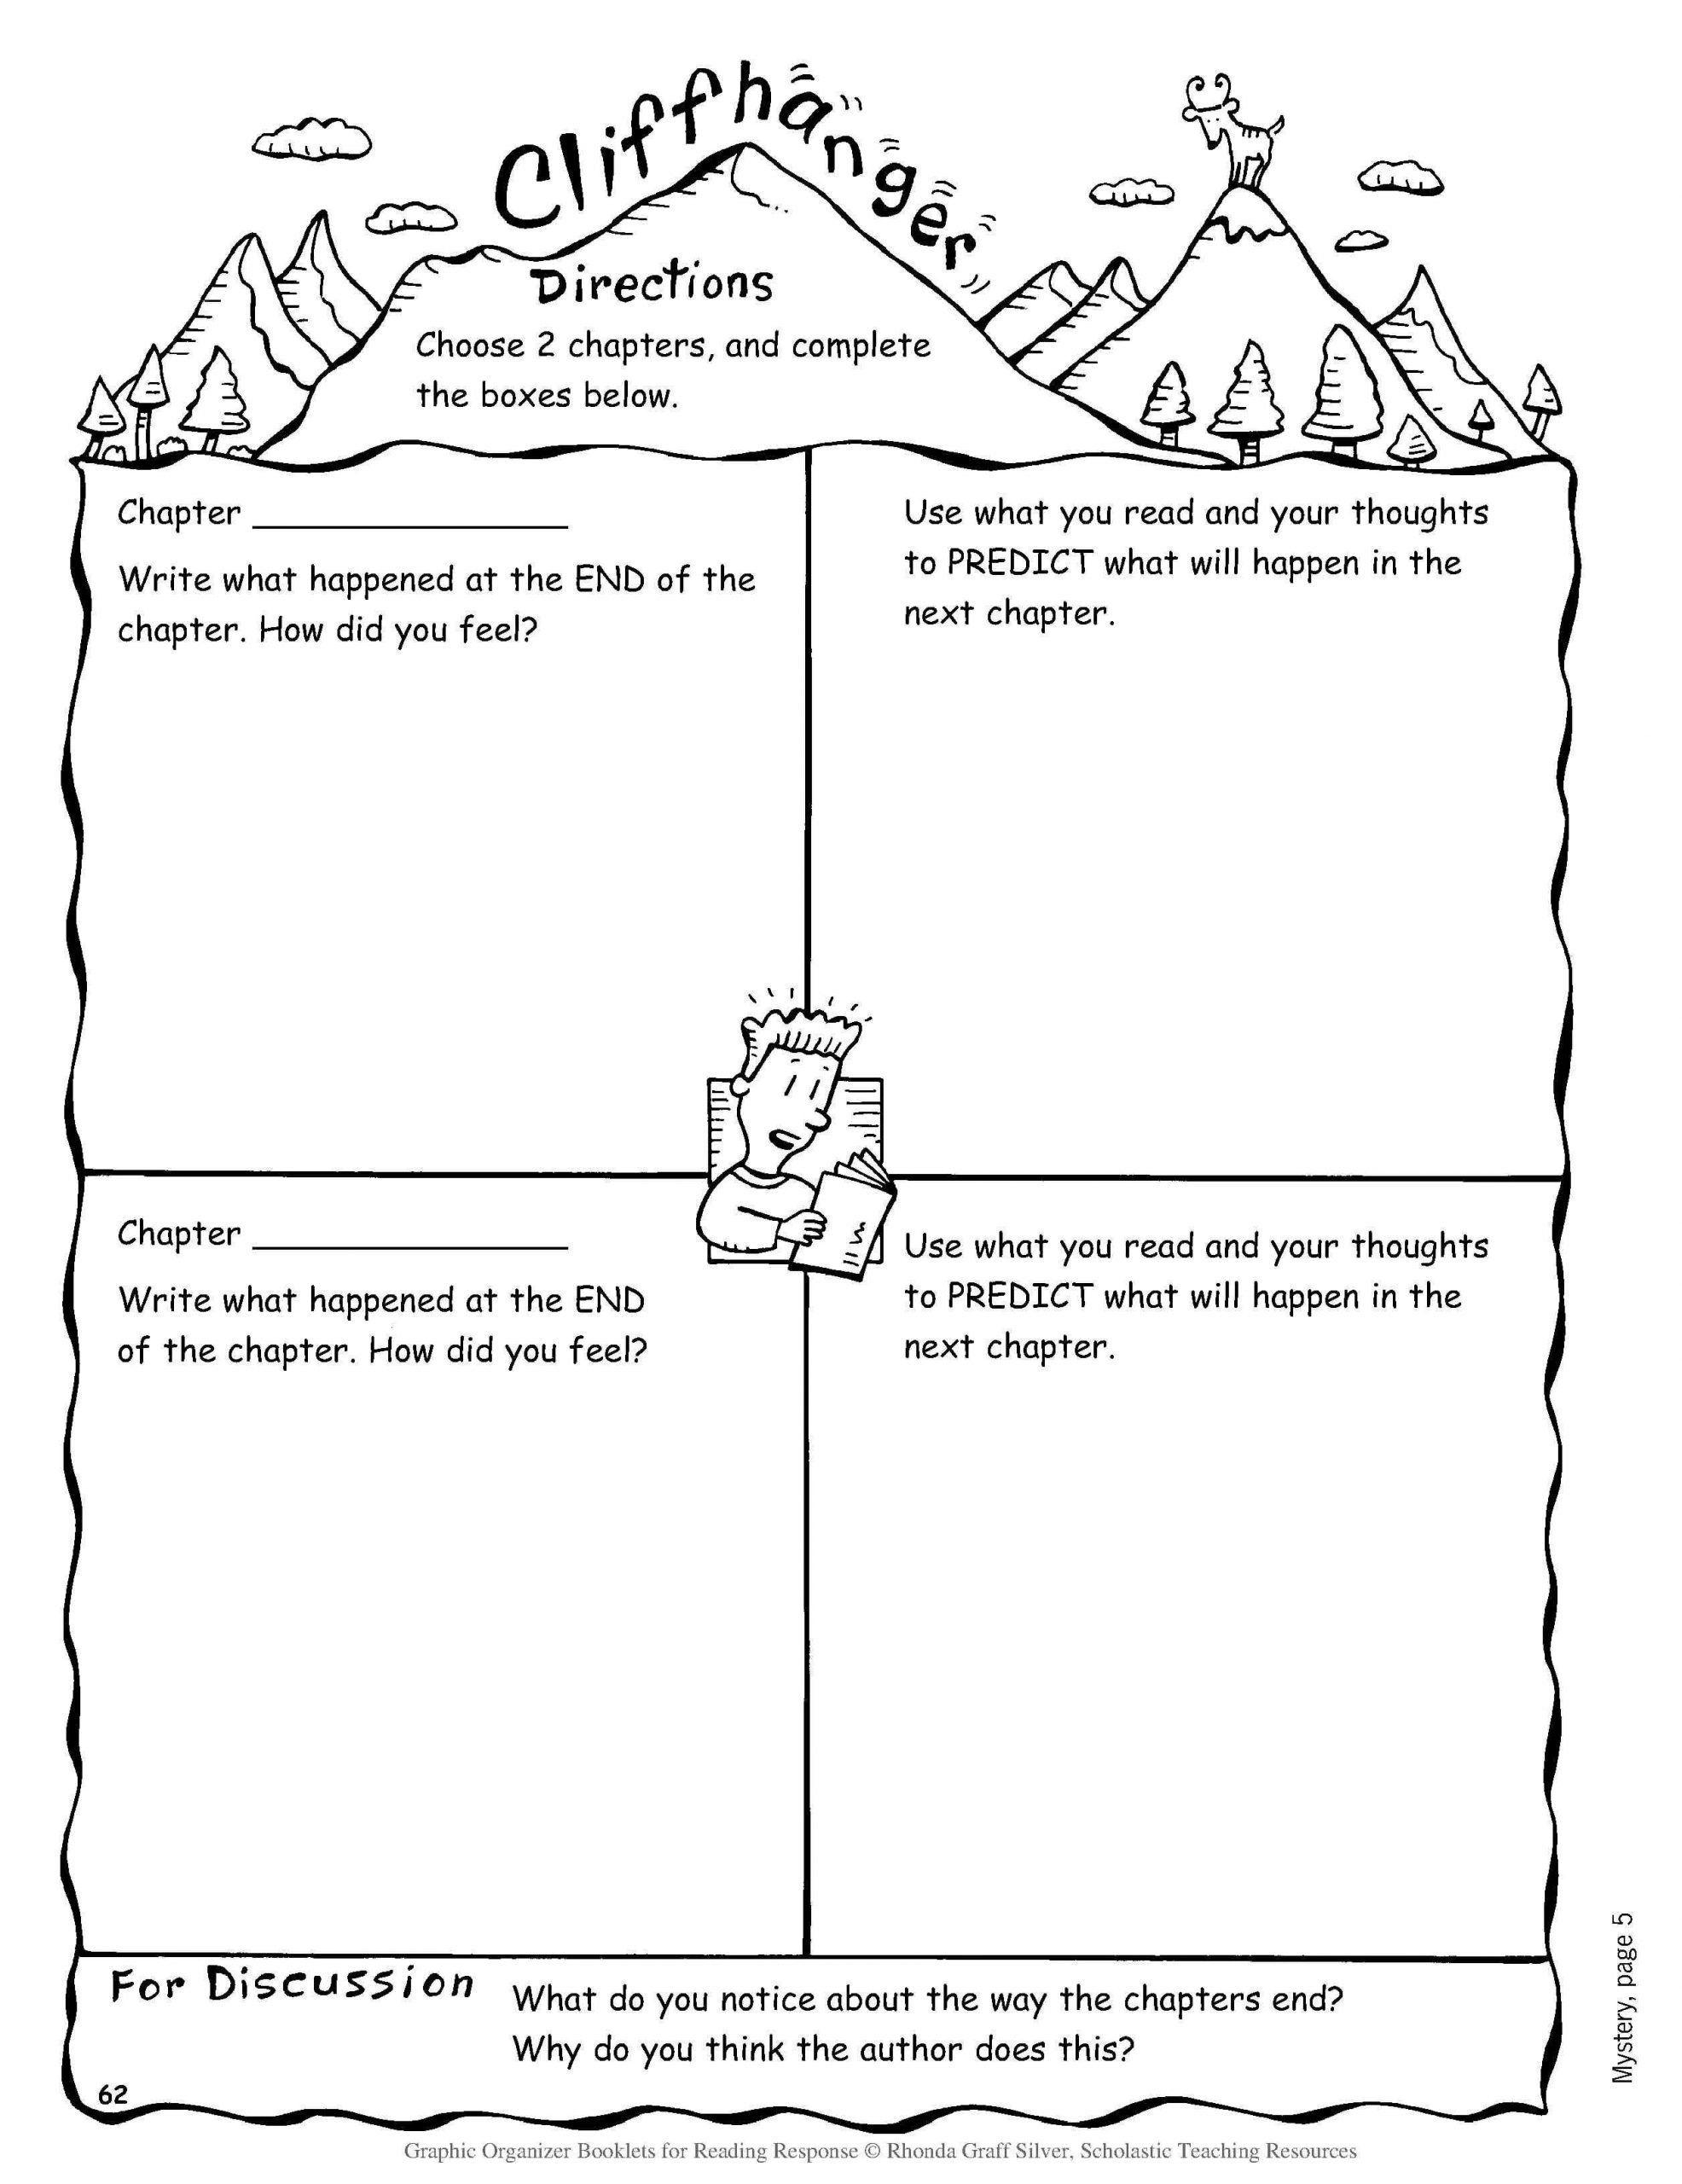 32 Genre Worksheet 3rd Grade In 2020 Mystery Genre Reading Graphic Organizers Summary Graphic Organizer